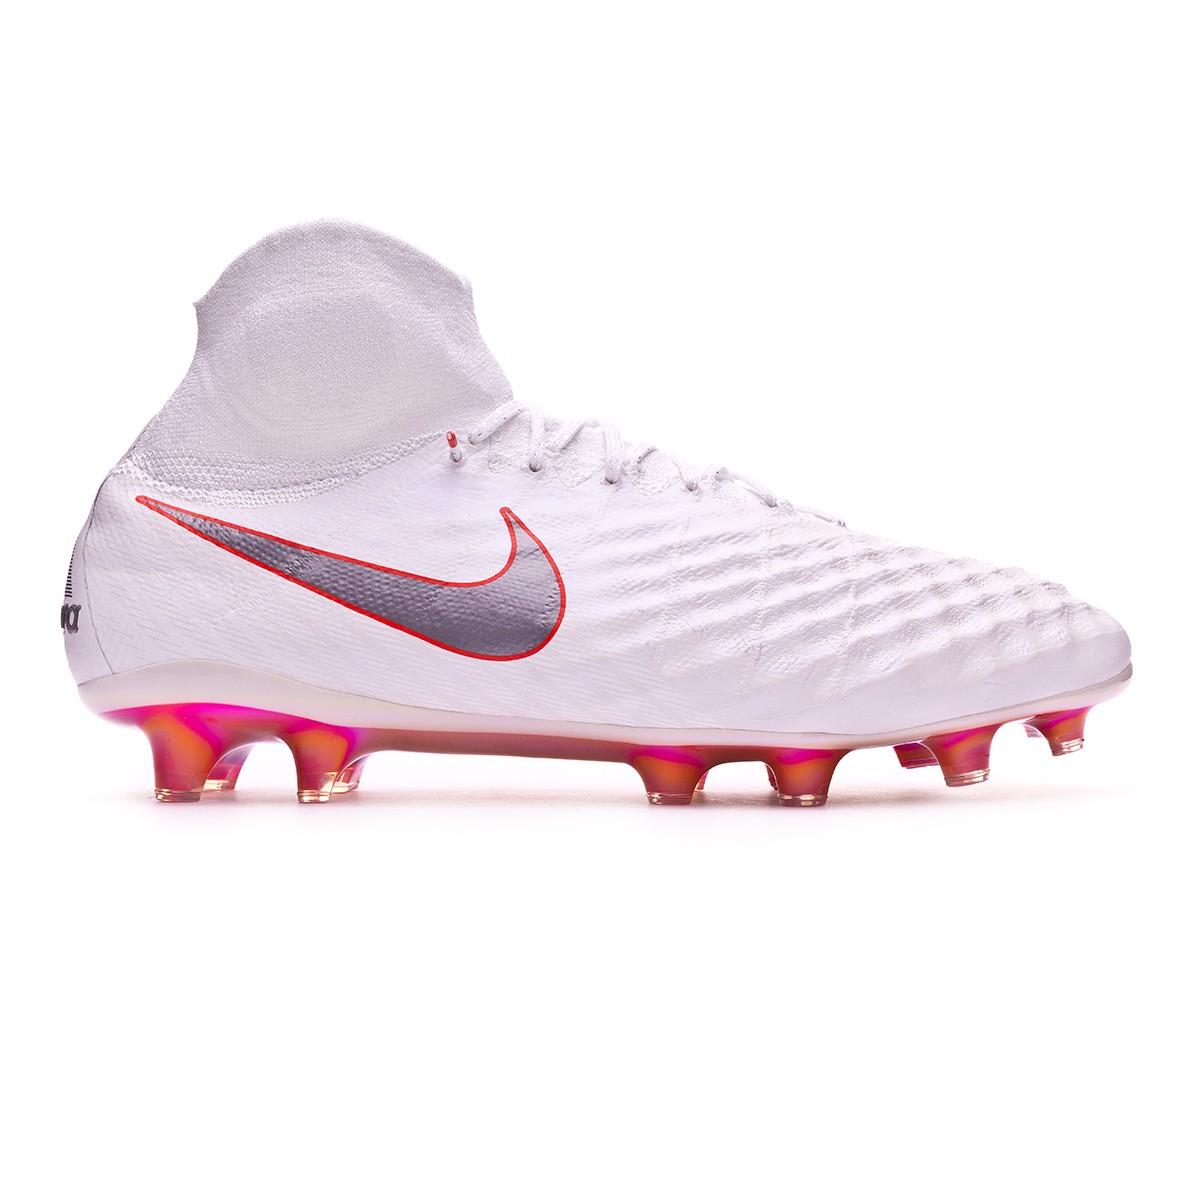 5d60cc19c47e Football Boots Nike Magista Obra II Elite DF FG White-Metallic cool  grey-Light crimson - Football store Fútbol Emotion